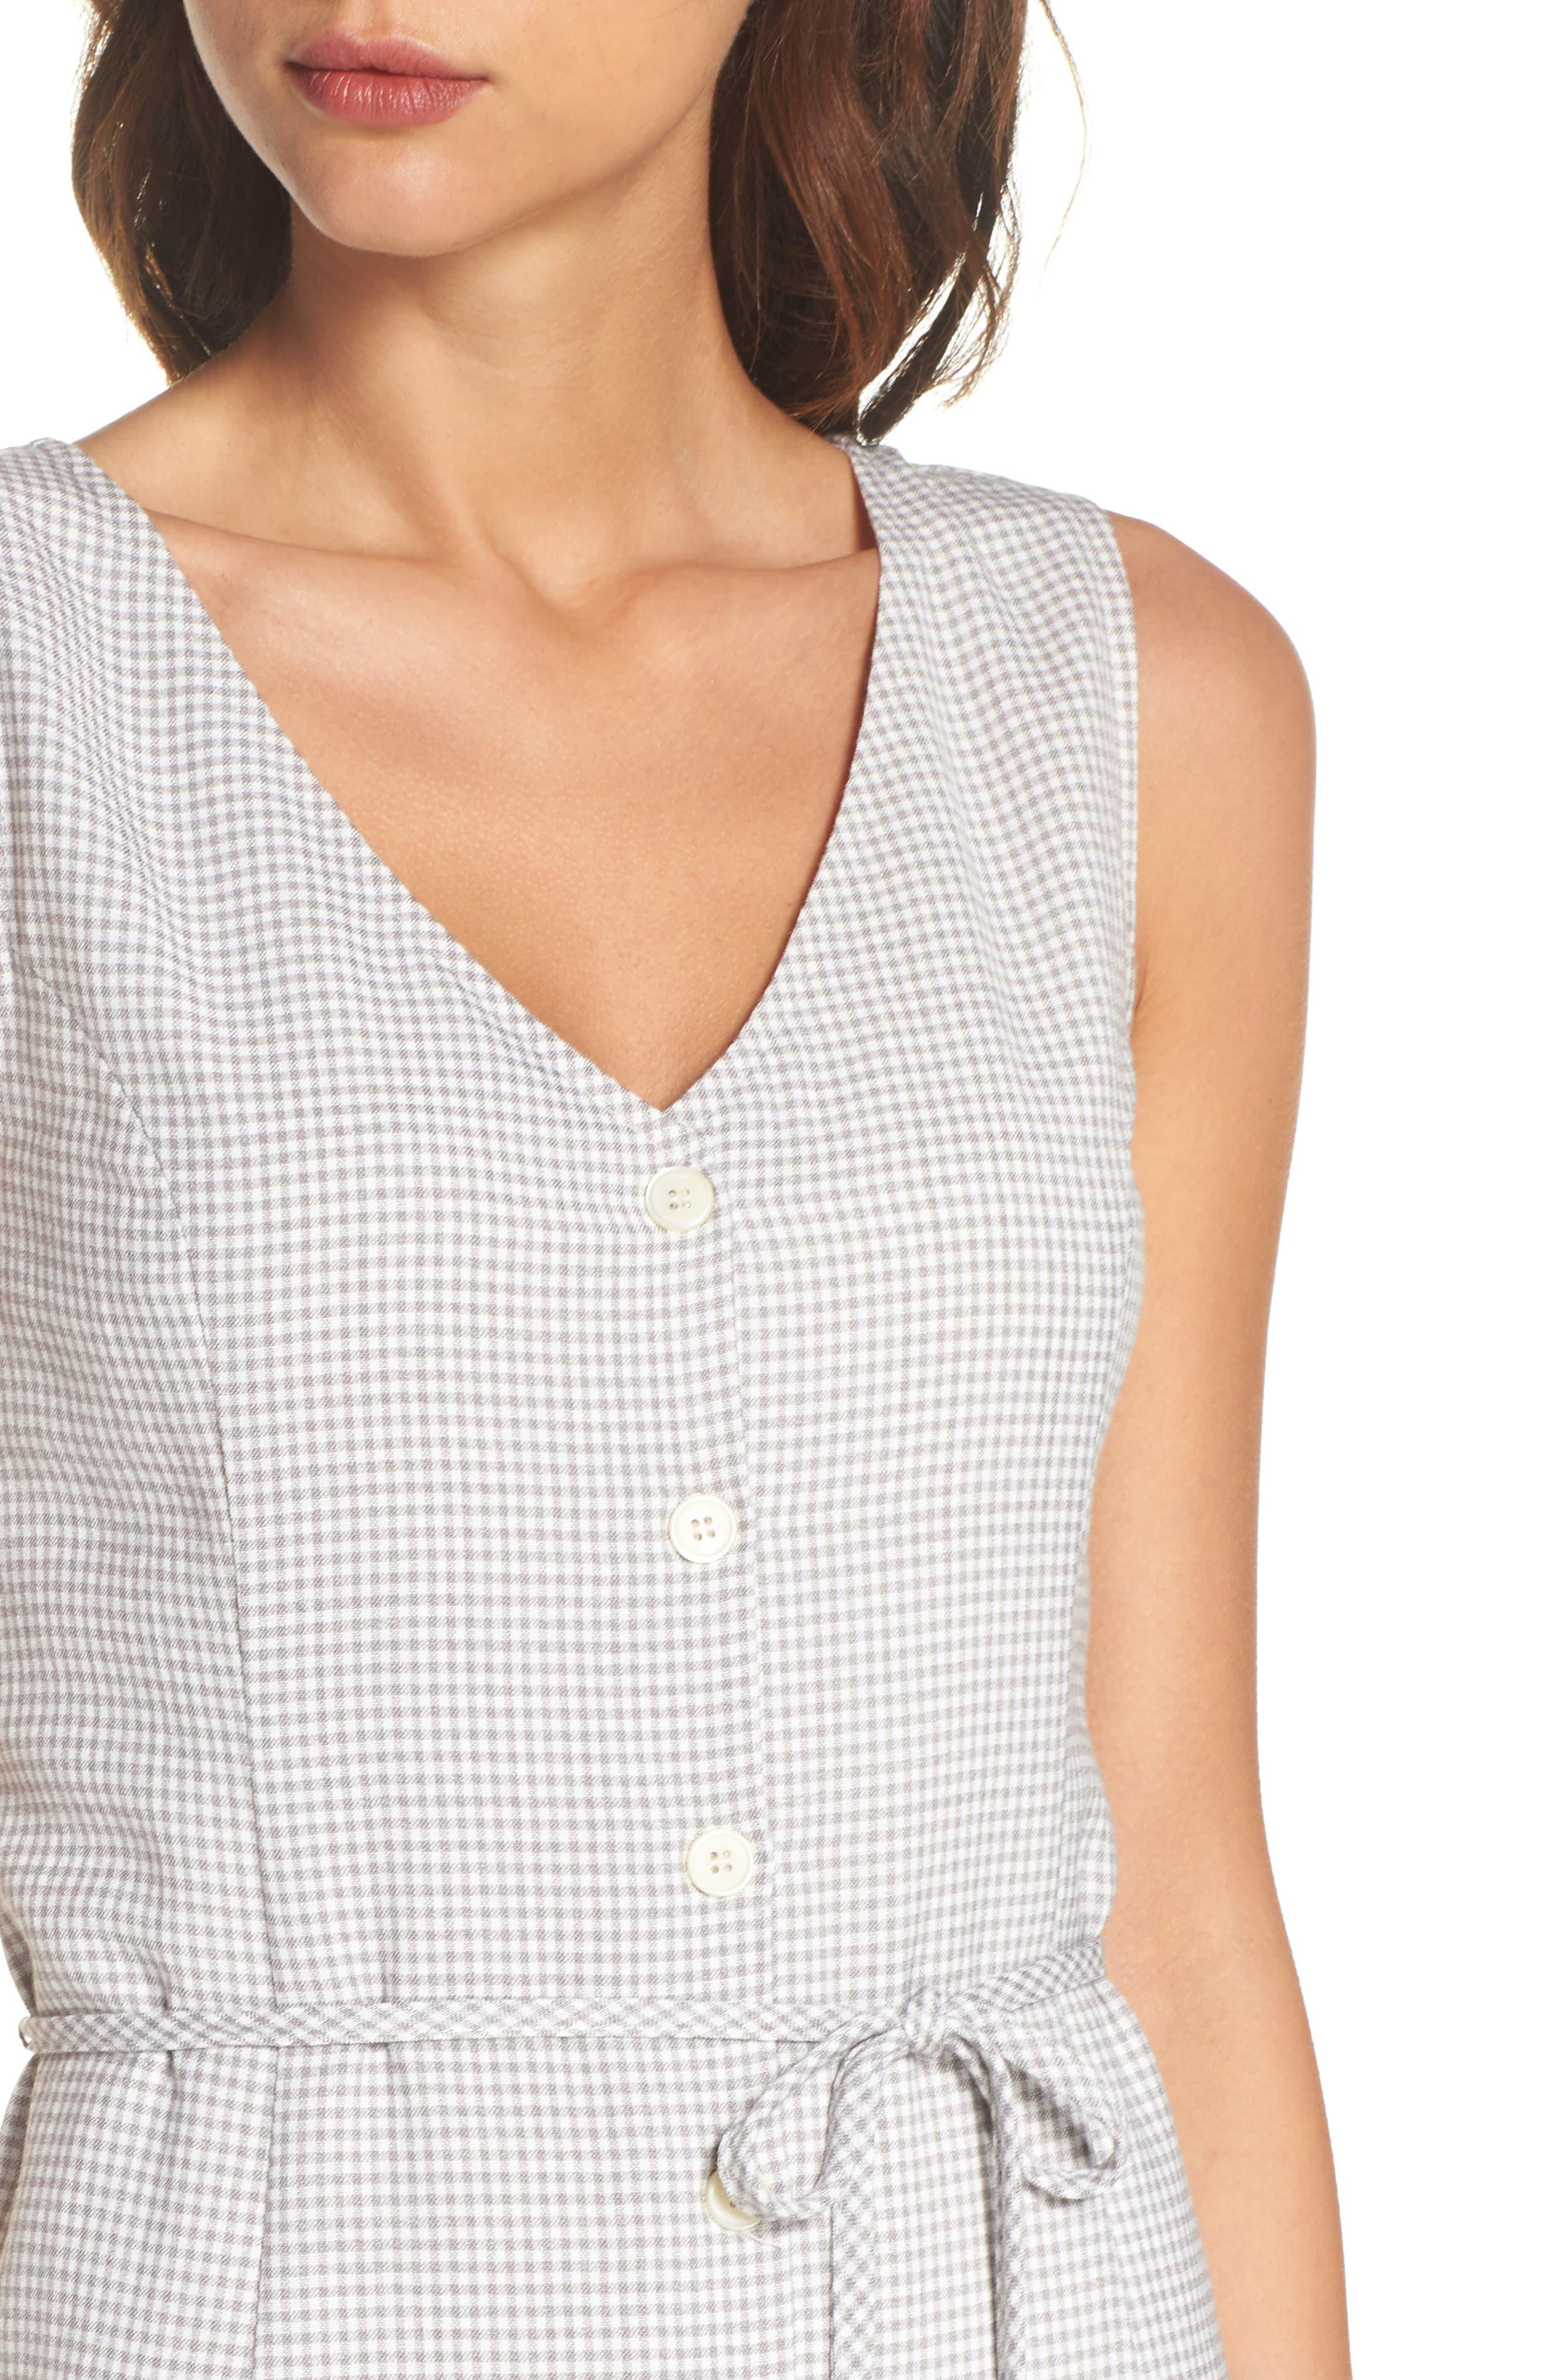 Gingham Midi Dress,                             Alternate thumbnail 4, color,                             Grey/ White